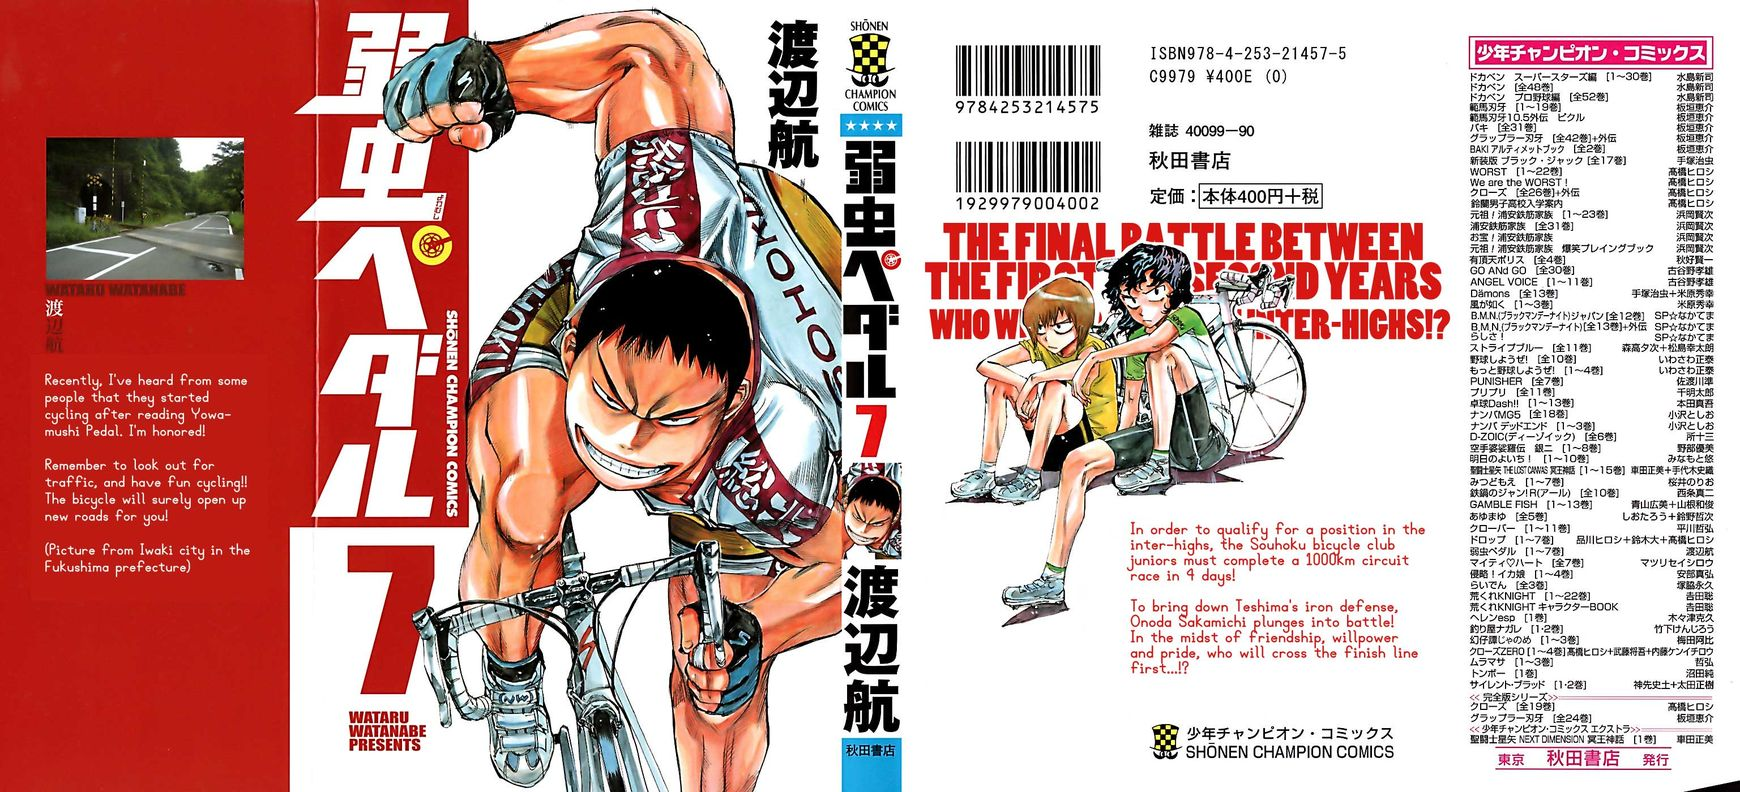 Yowamushi Pedal 53 Page 1